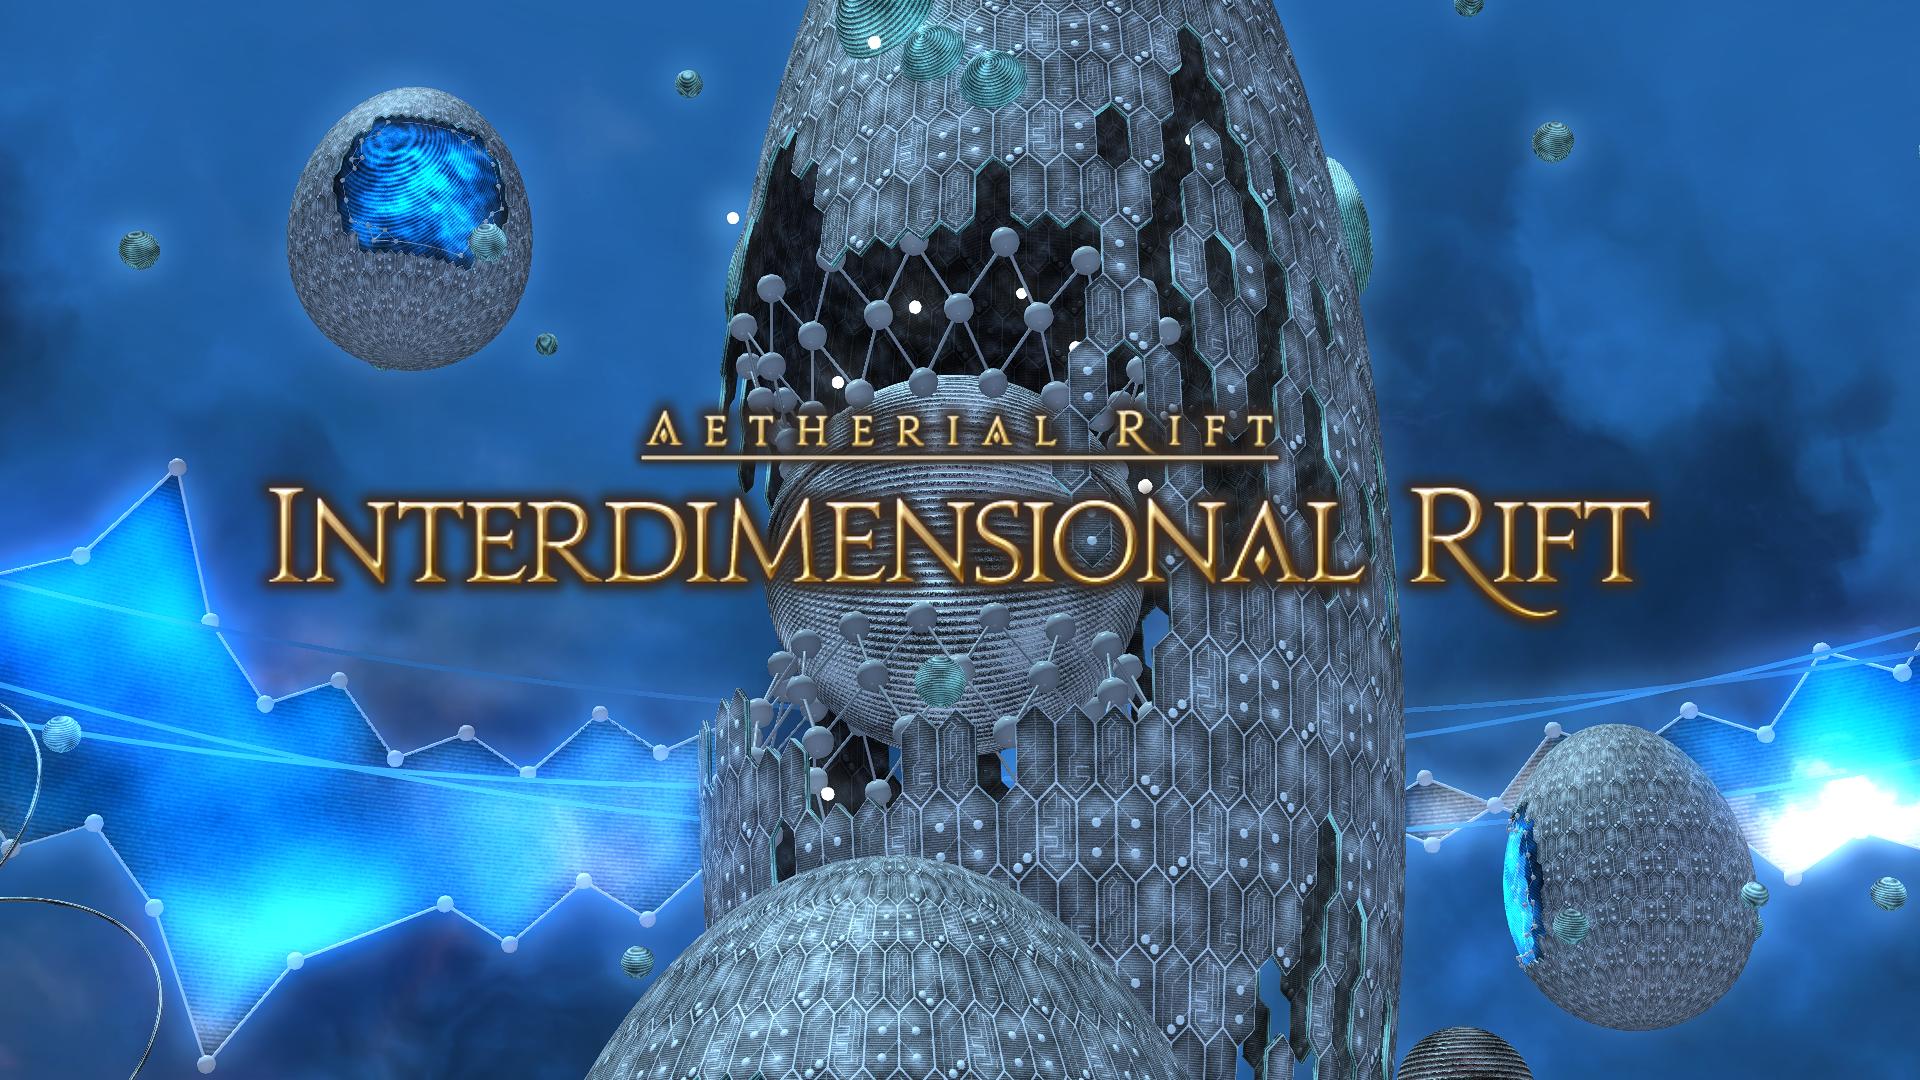 Interdimensional Rift (Final Fantasy XIV)